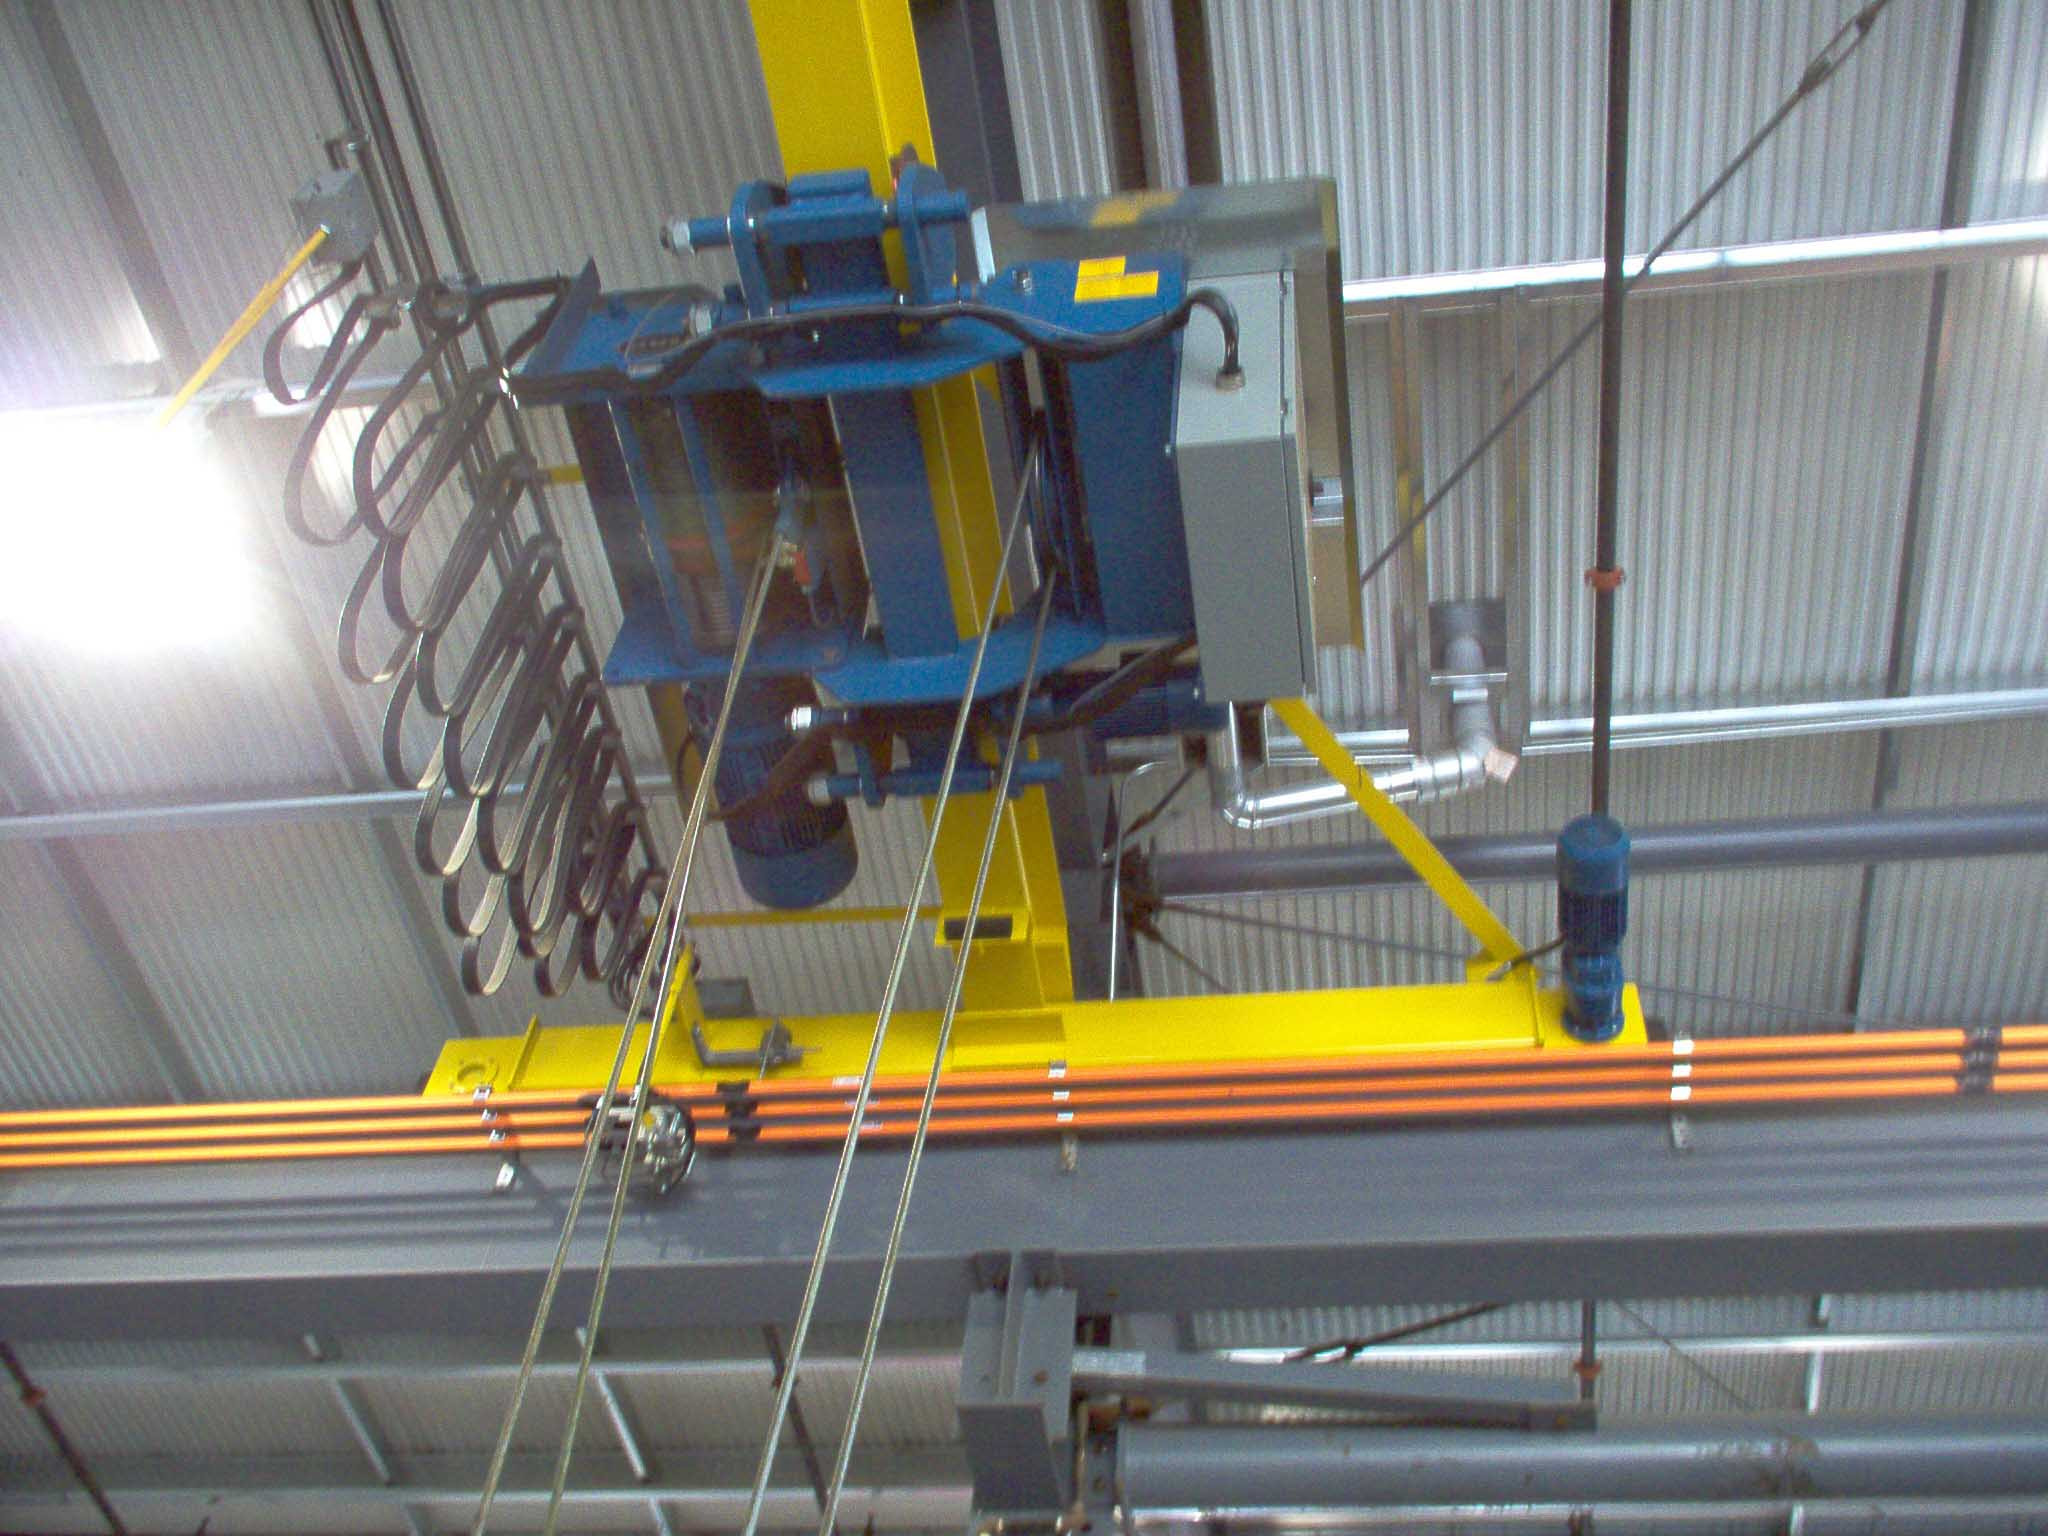 Crane and Hoist Operator Safety